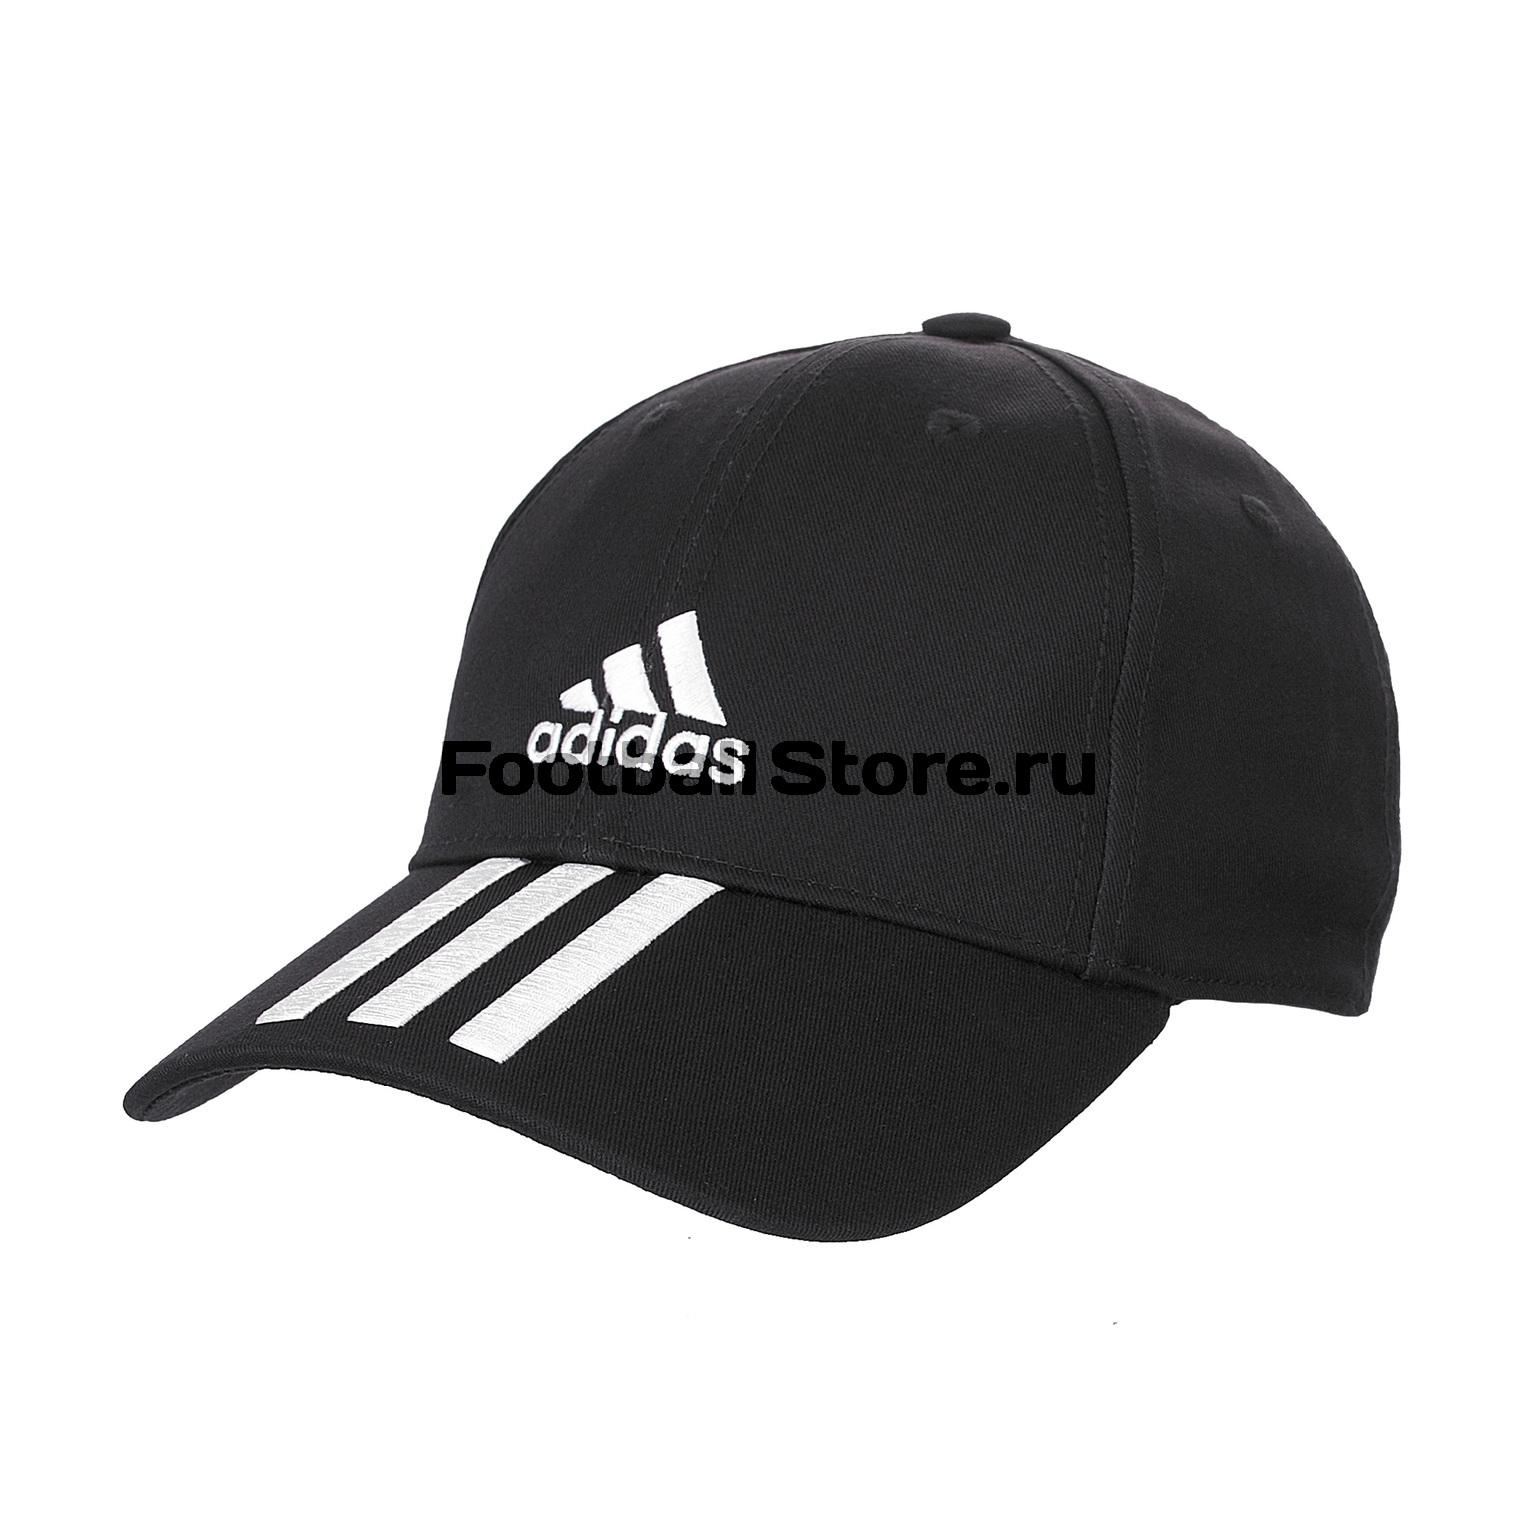 Бейсболка Adidas Tiro C40 Cap DQ1073